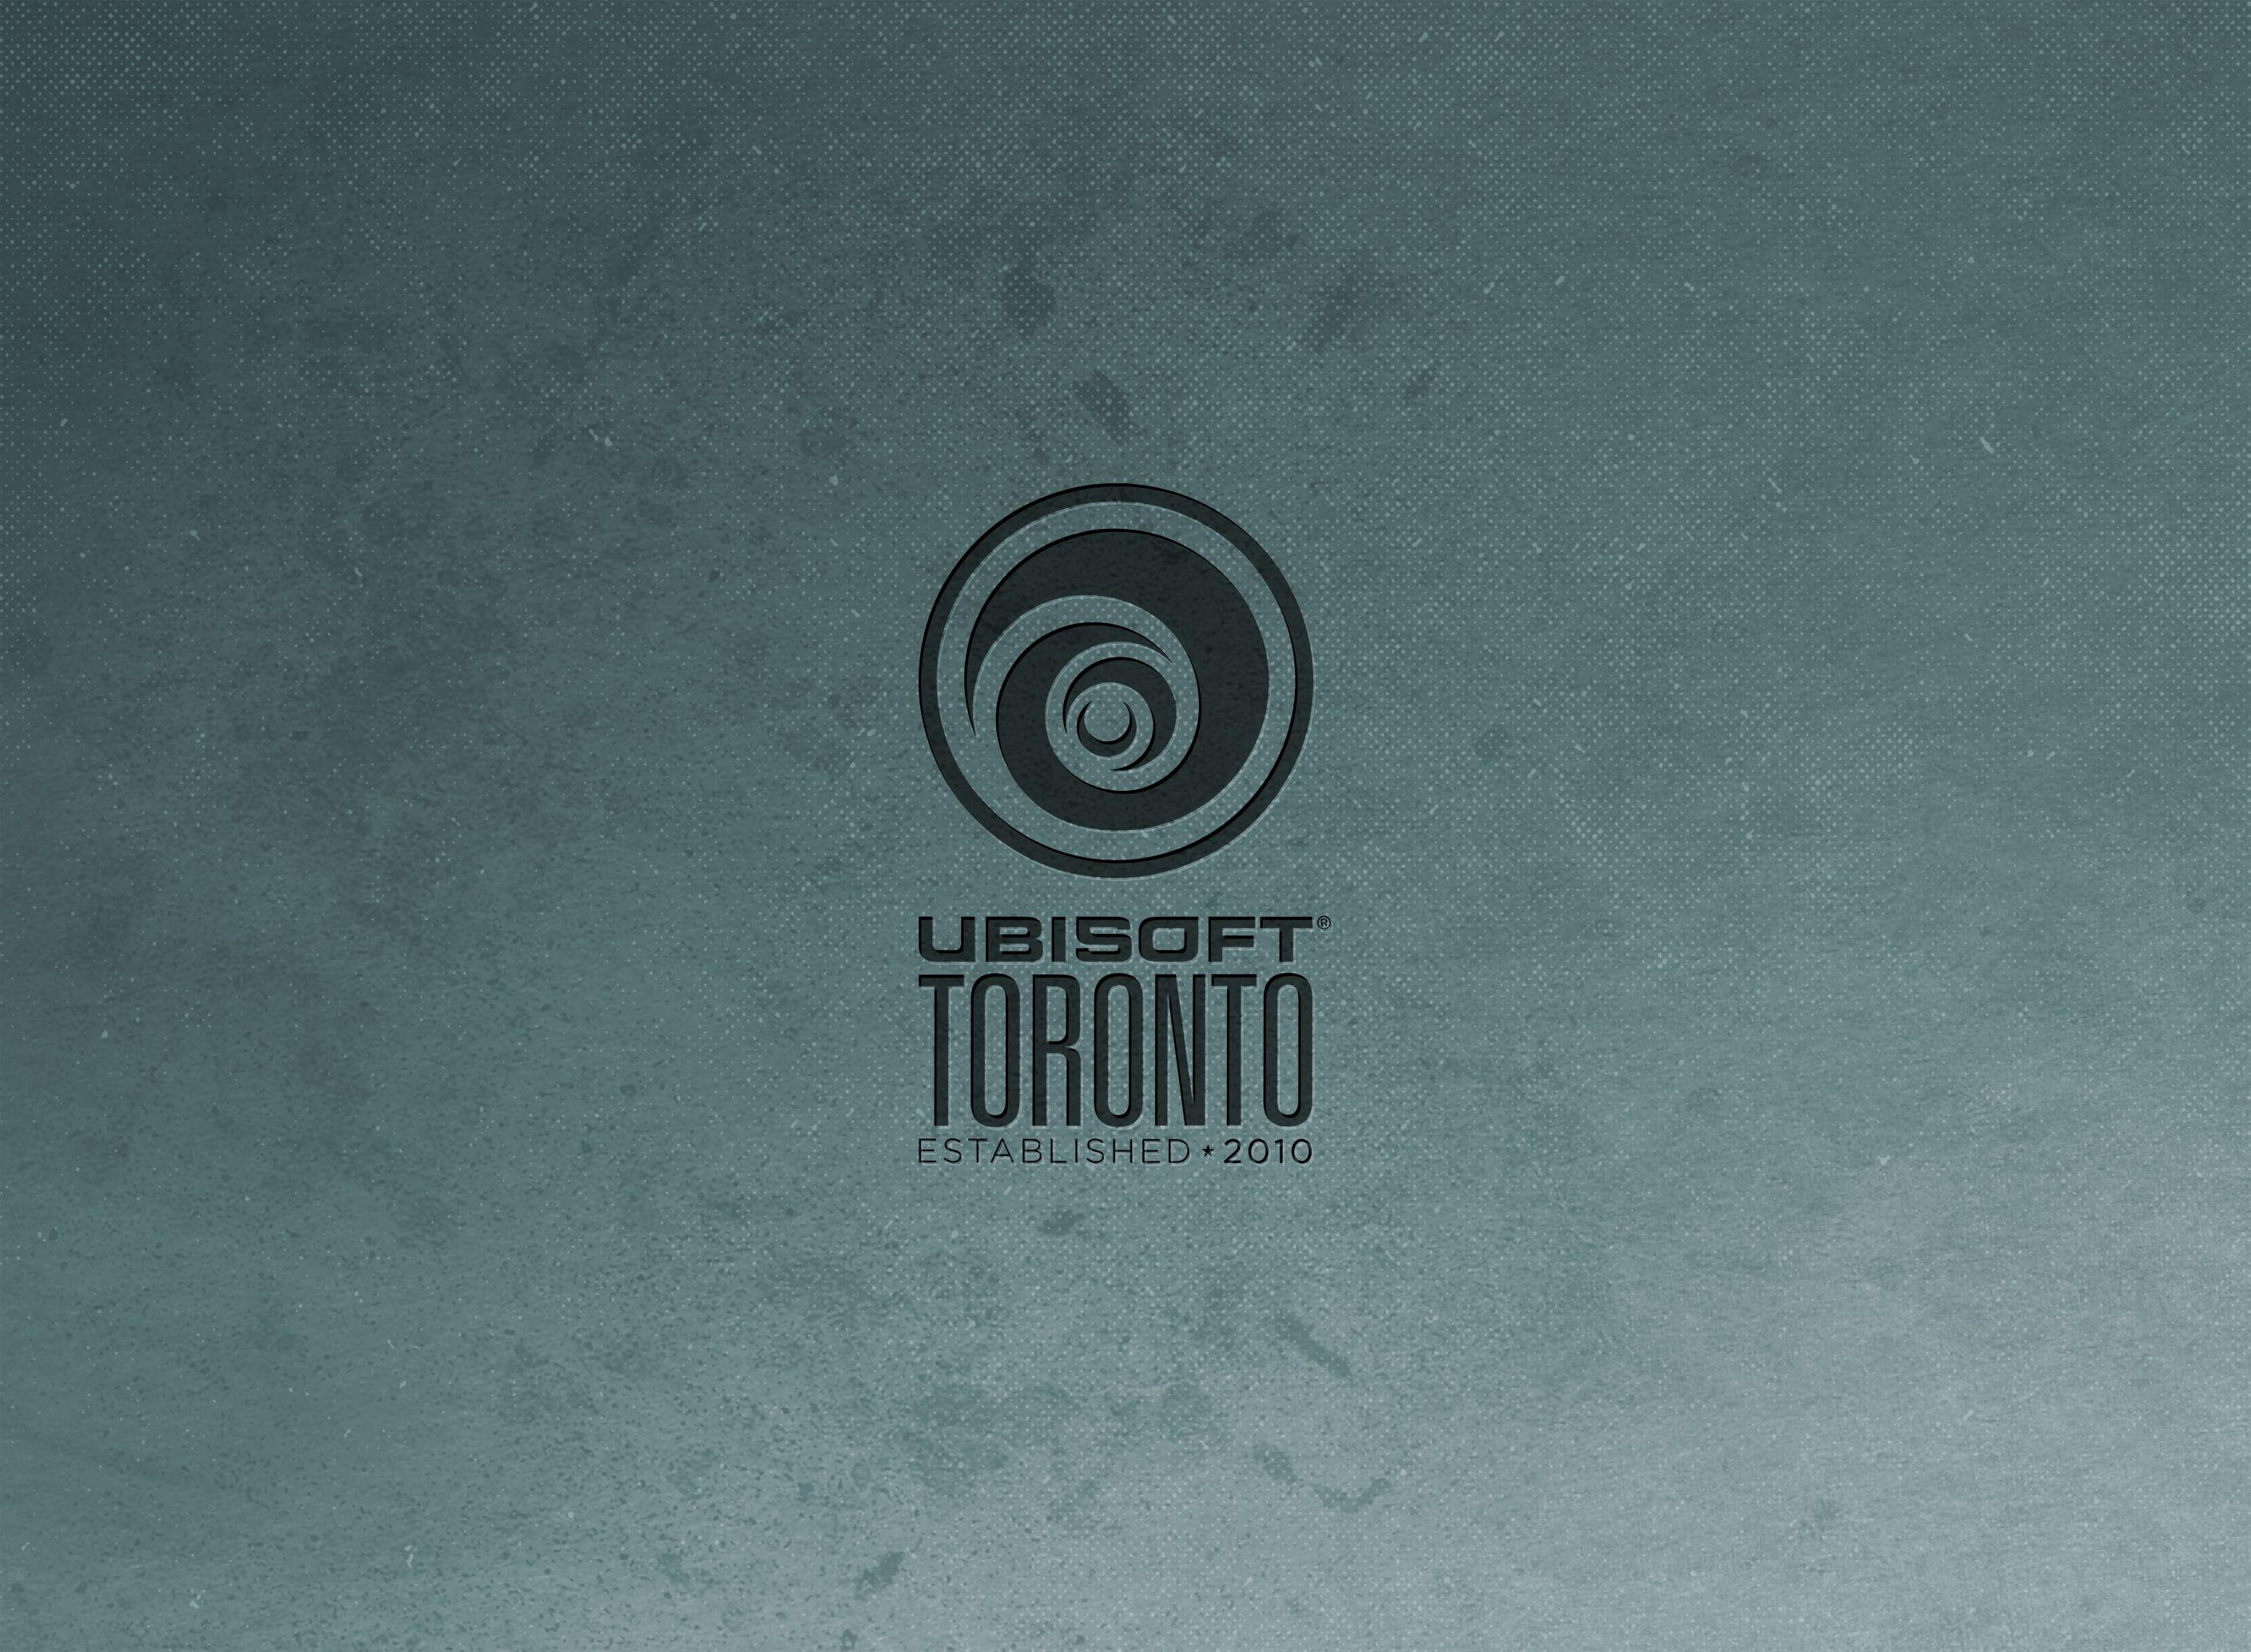 Ubisoft toronto 5 year anniversary book design. picphic design